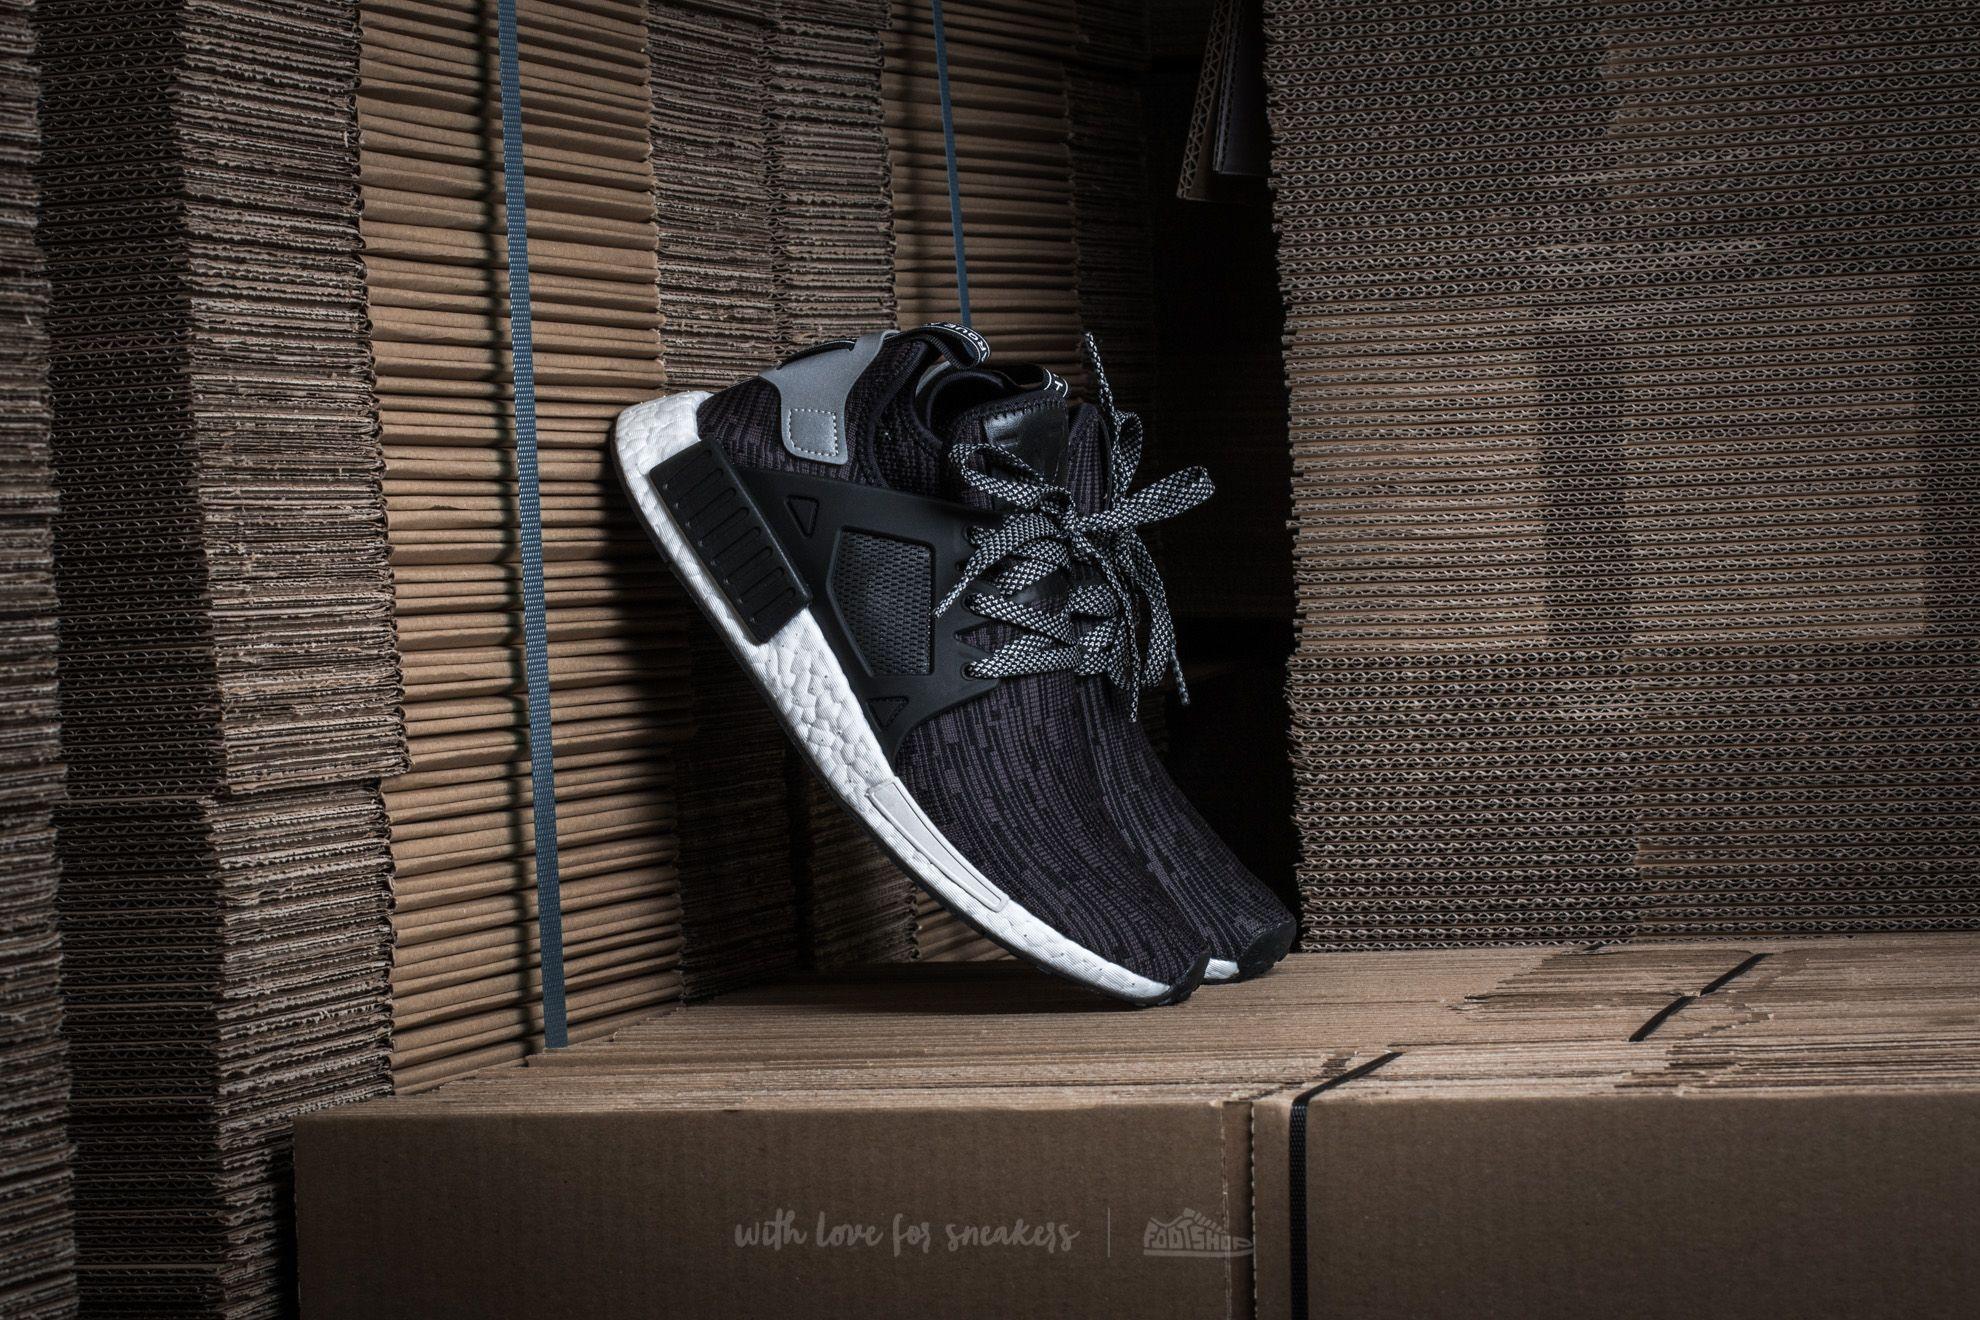 adidas nmd footshop cheap online